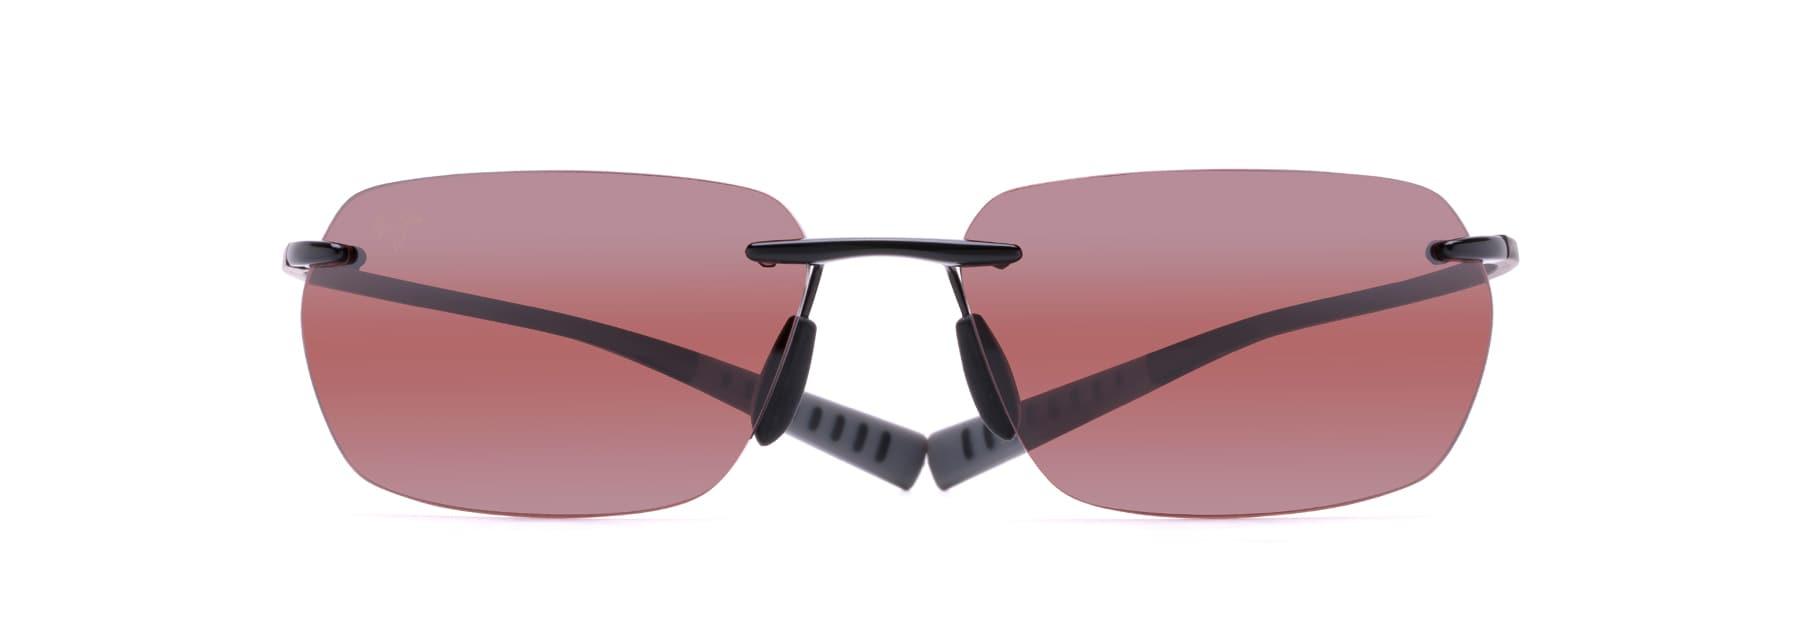 1806cc4c34 Alaka i Polarized Sunglasses